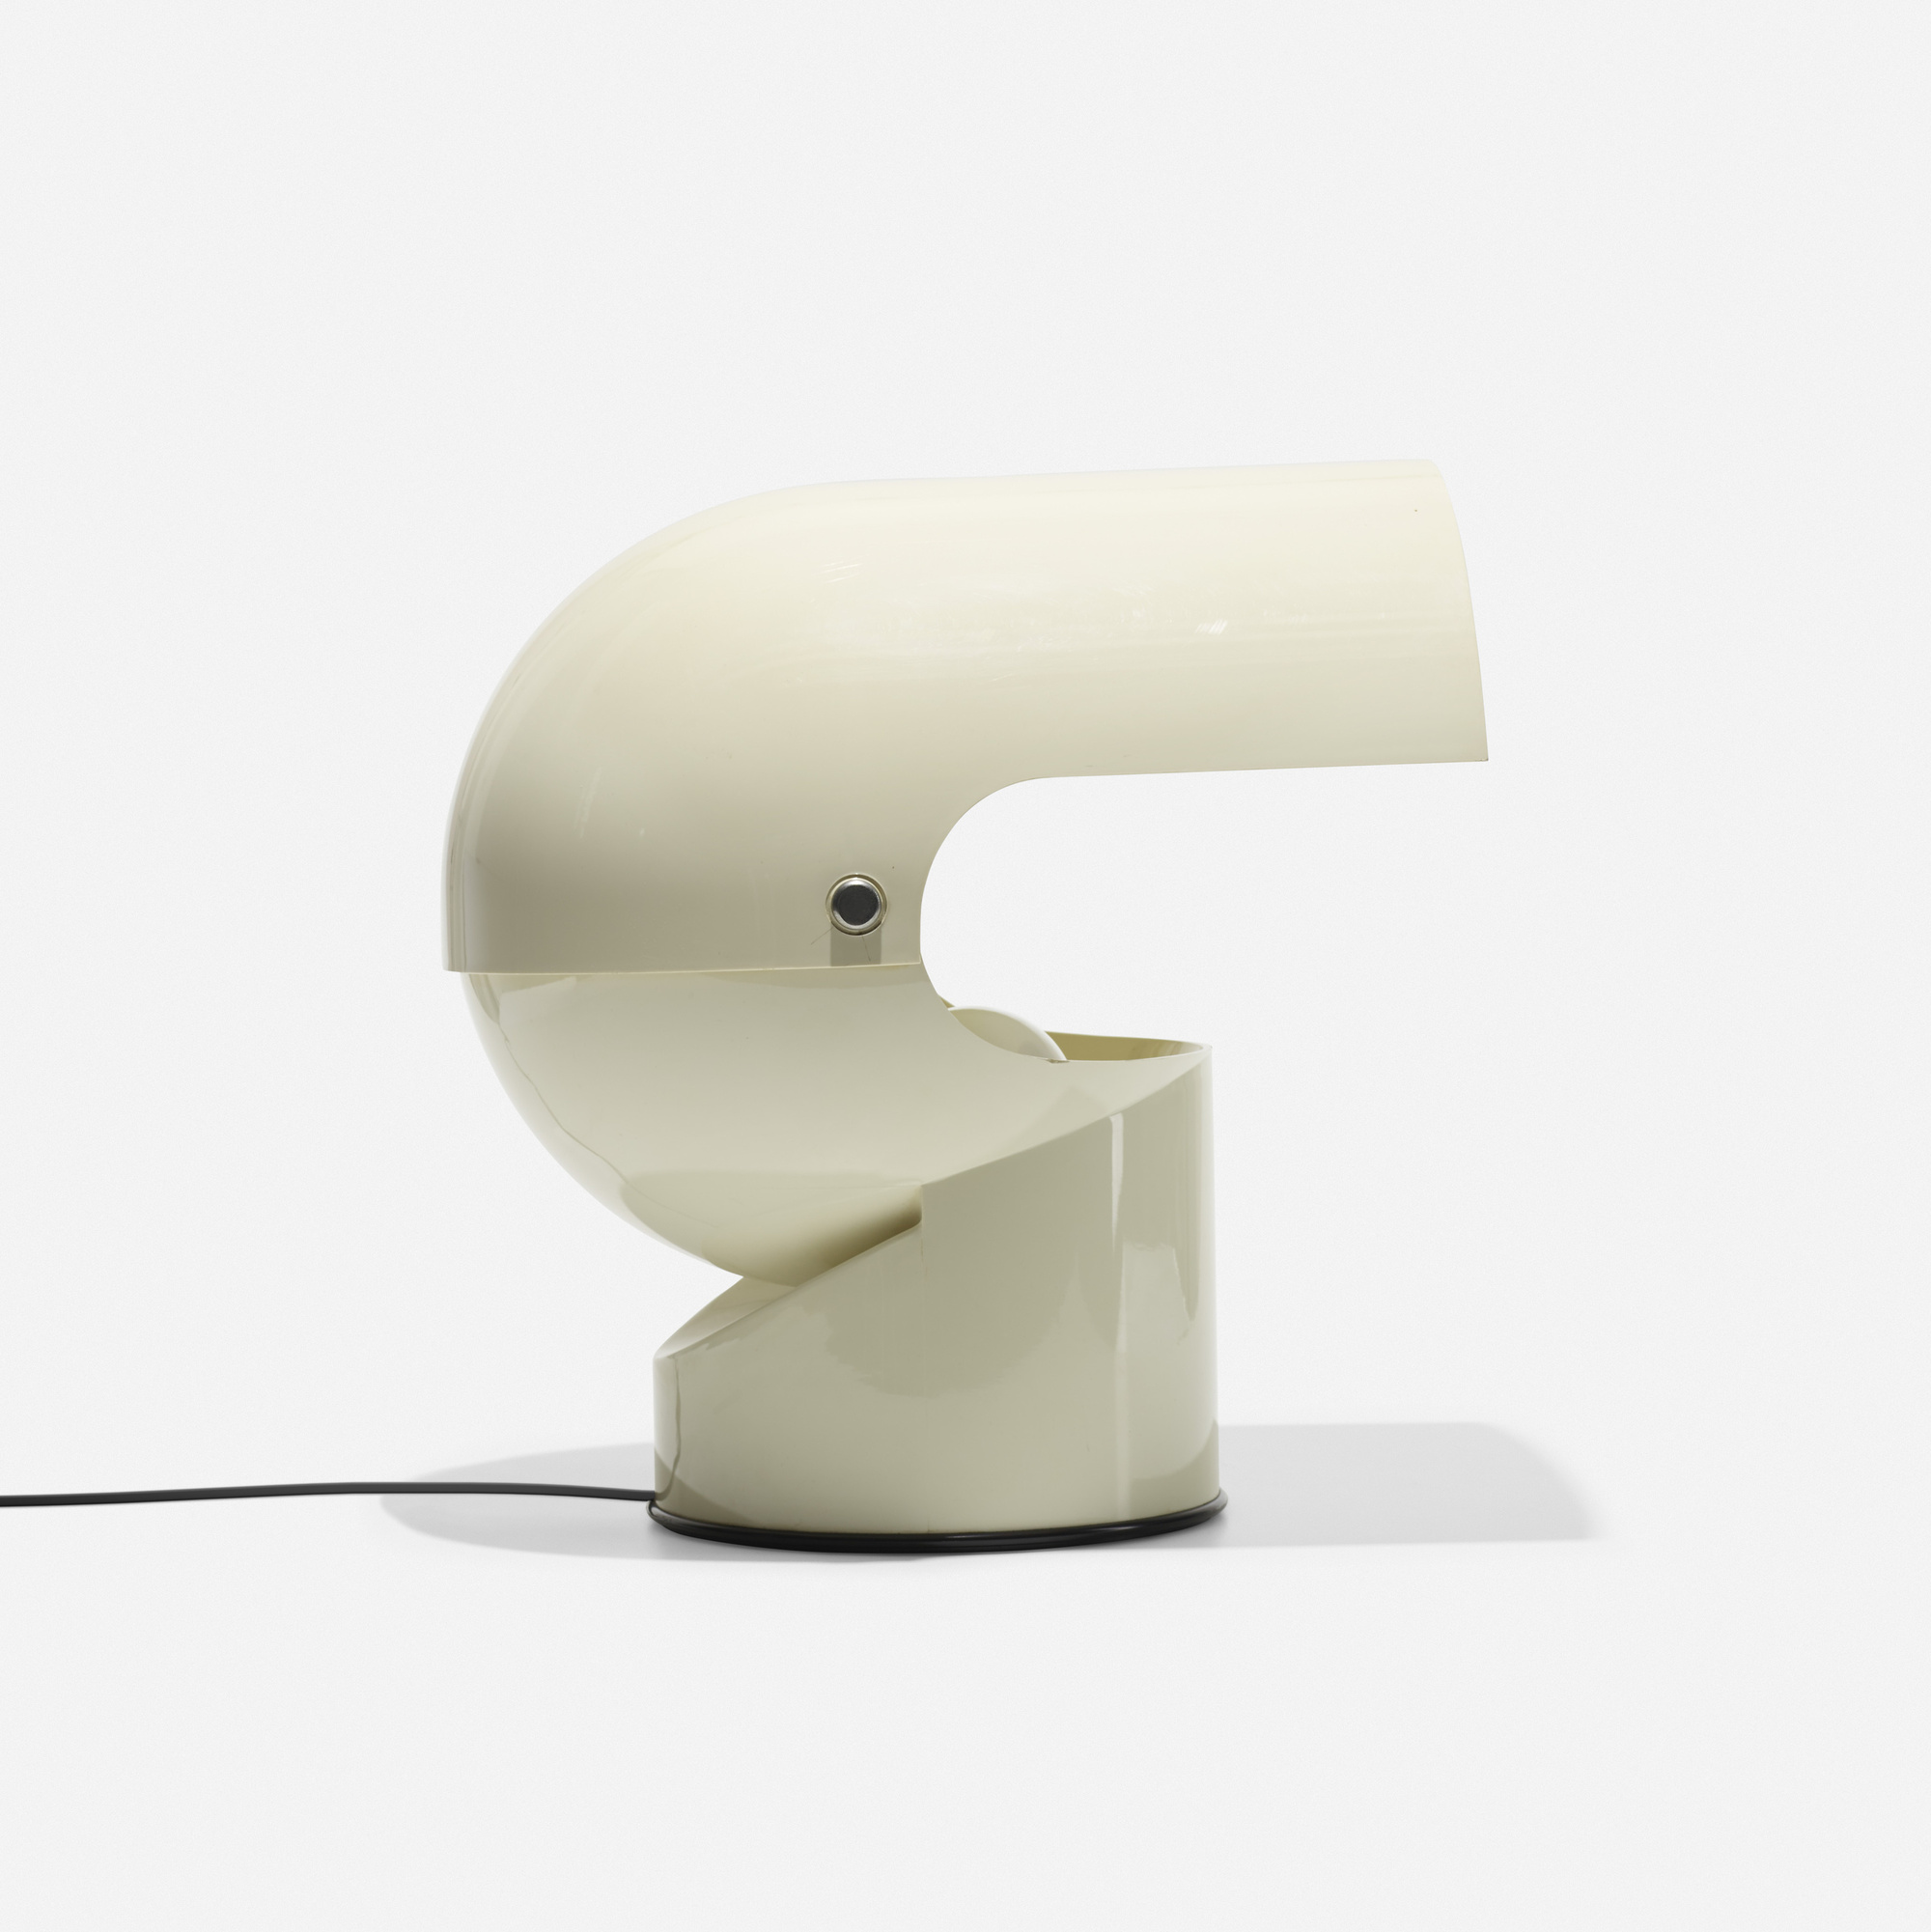 204: Gae Aulenti / Mezzopileo table lamp (1 of 3)